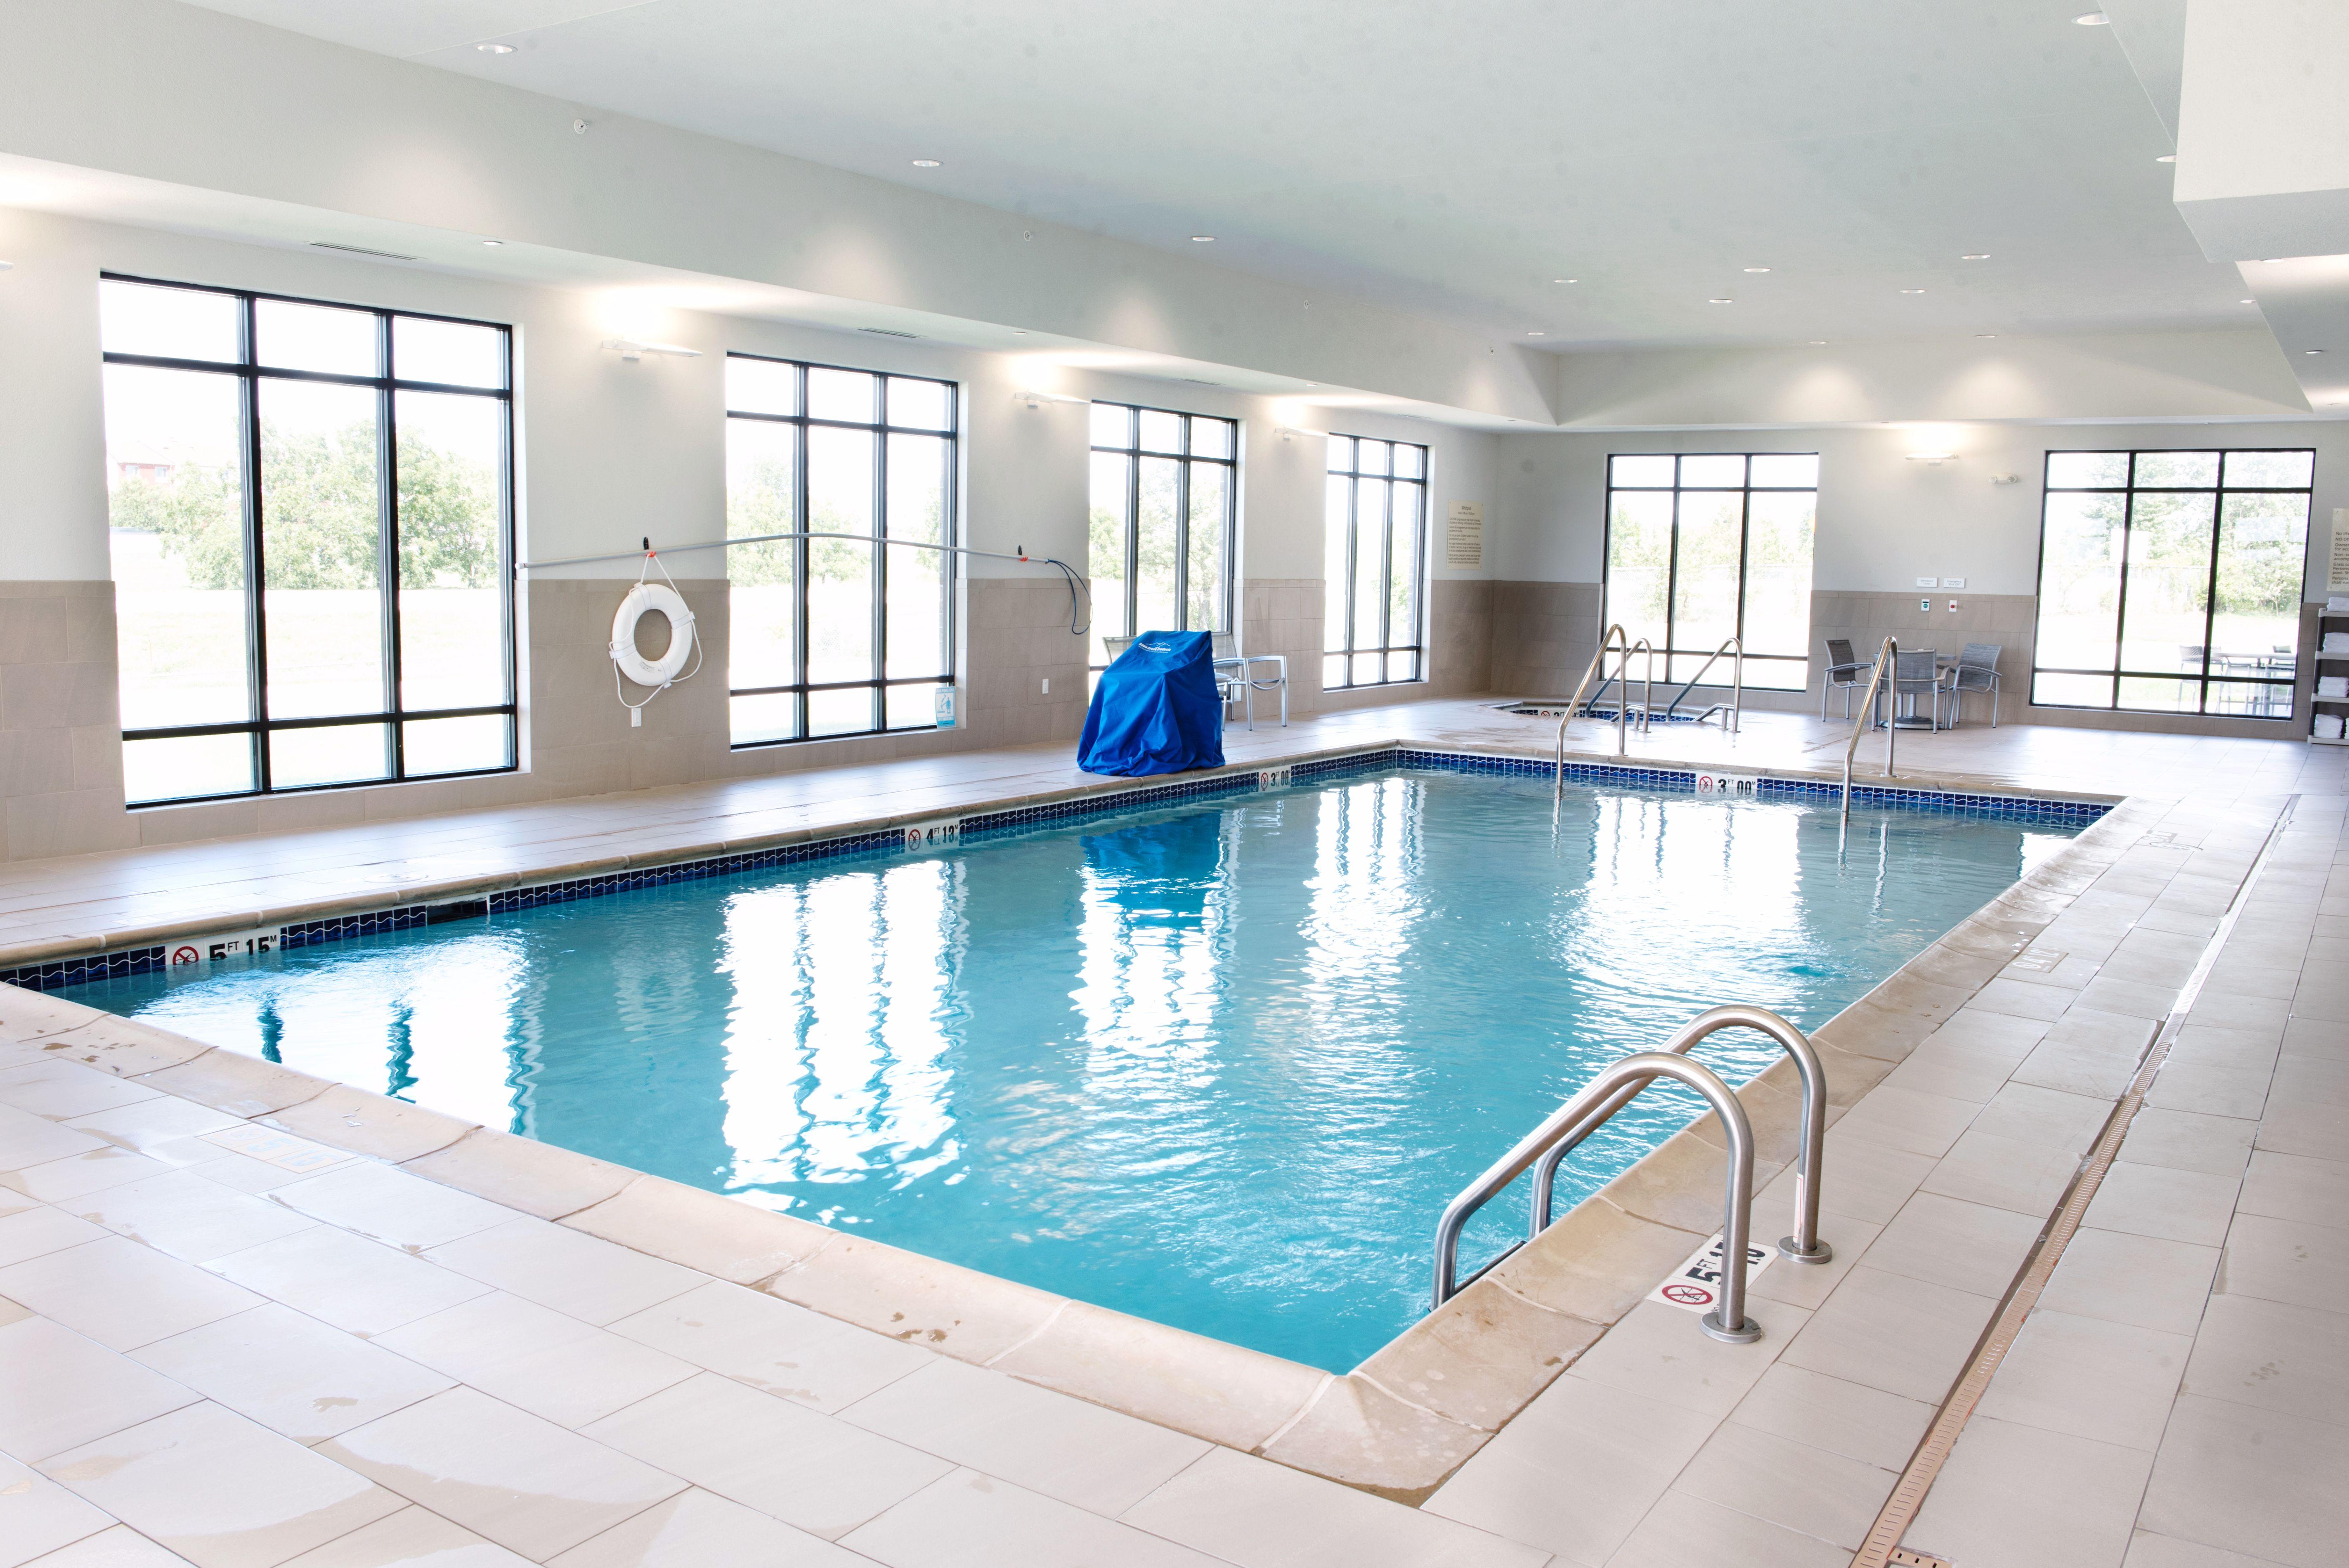 Hampton Inn Suites Des Moines Urbandale Urbandale Iowa Ia